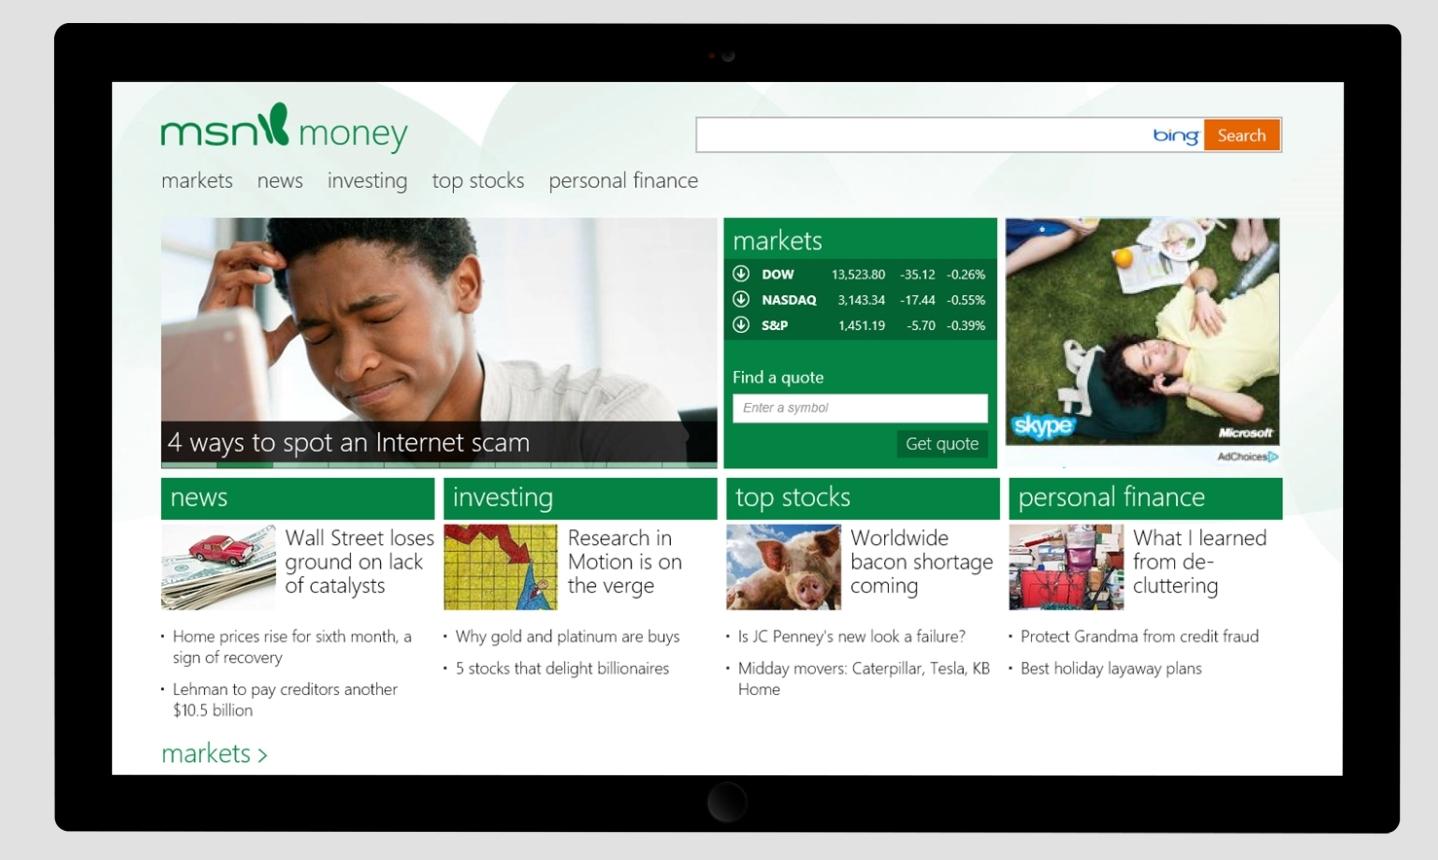 MSN Gets Major Refresh With Windows 8 - Kara Swisher